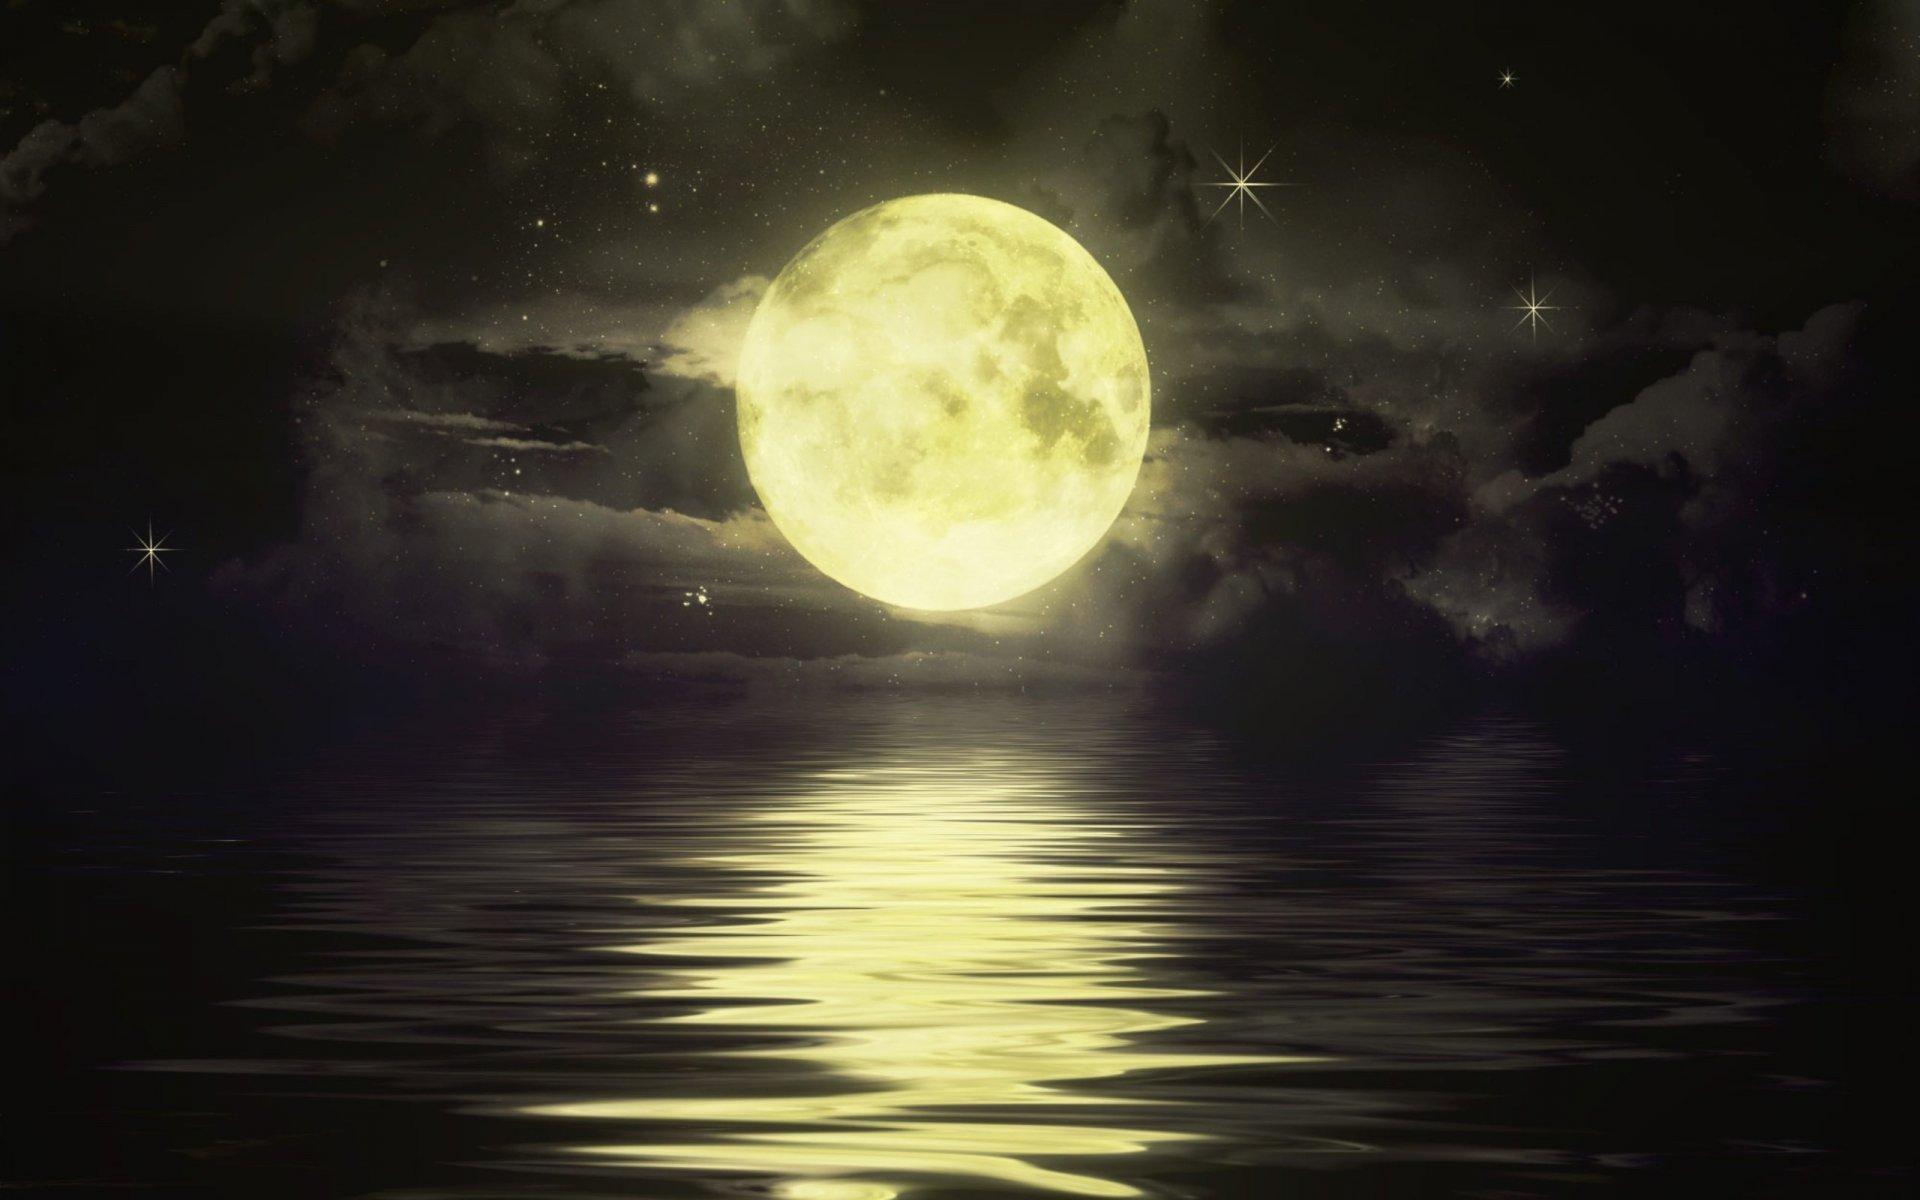 Moon track photo